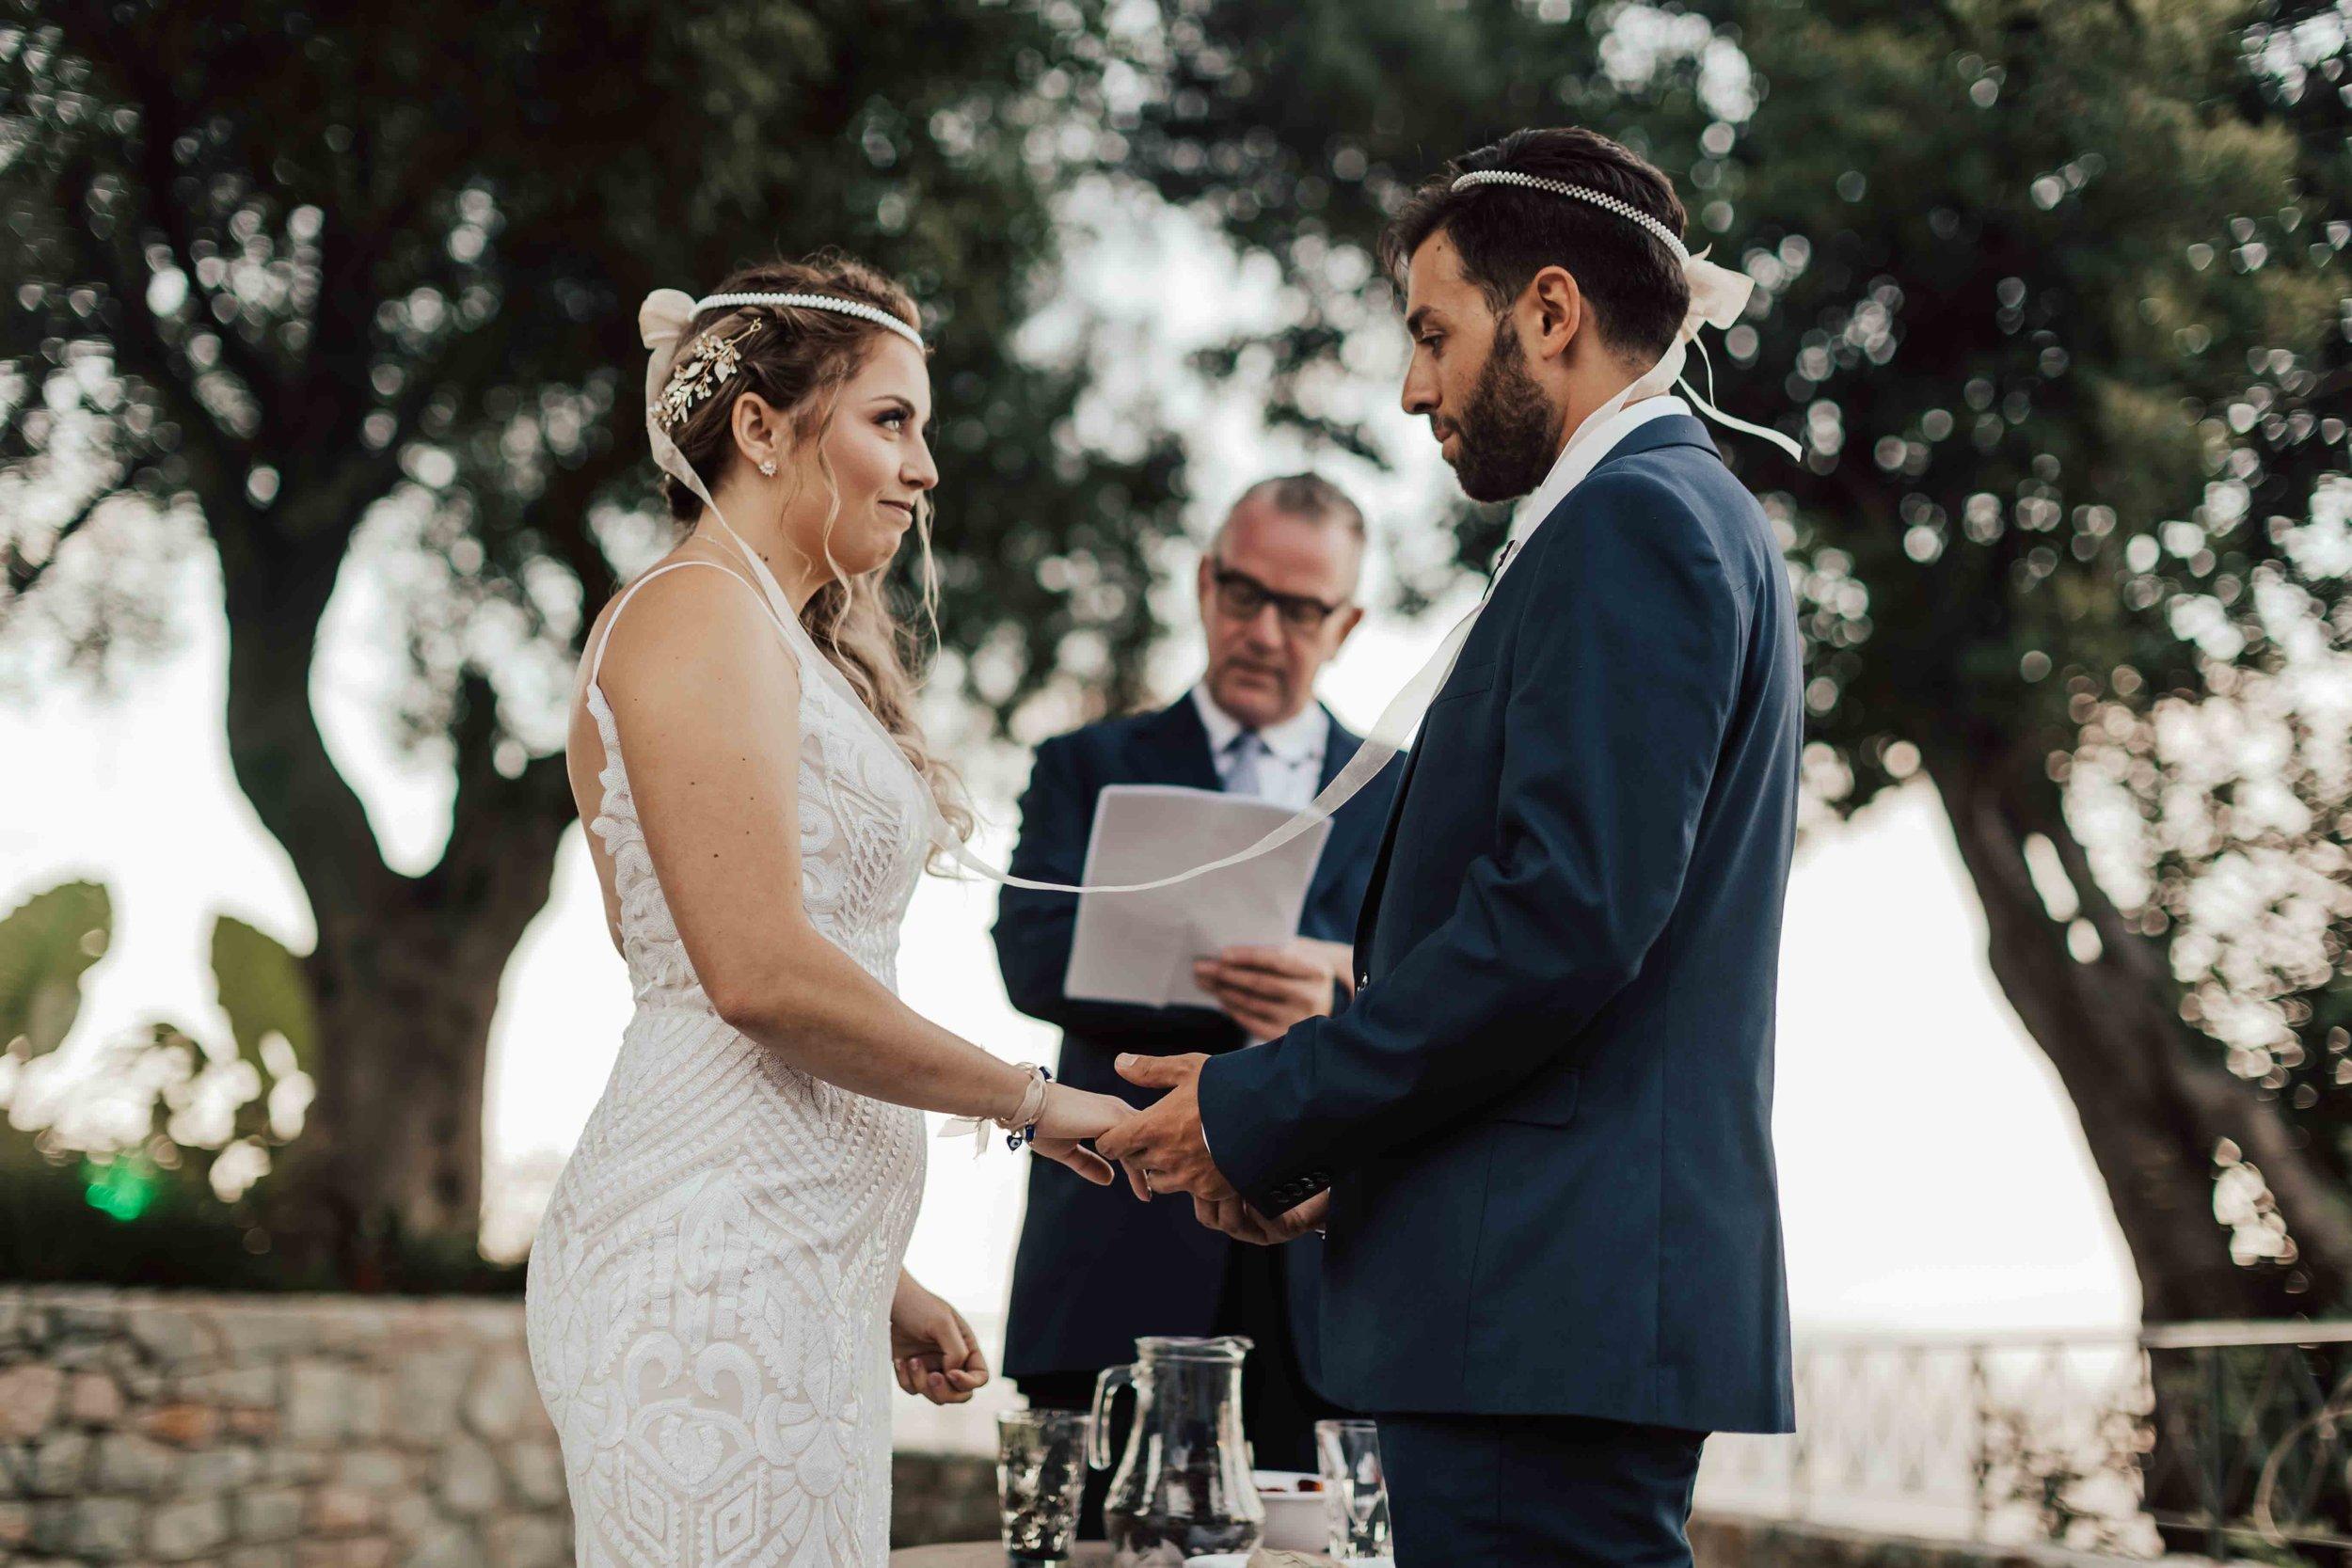 weddingday-16.jpg